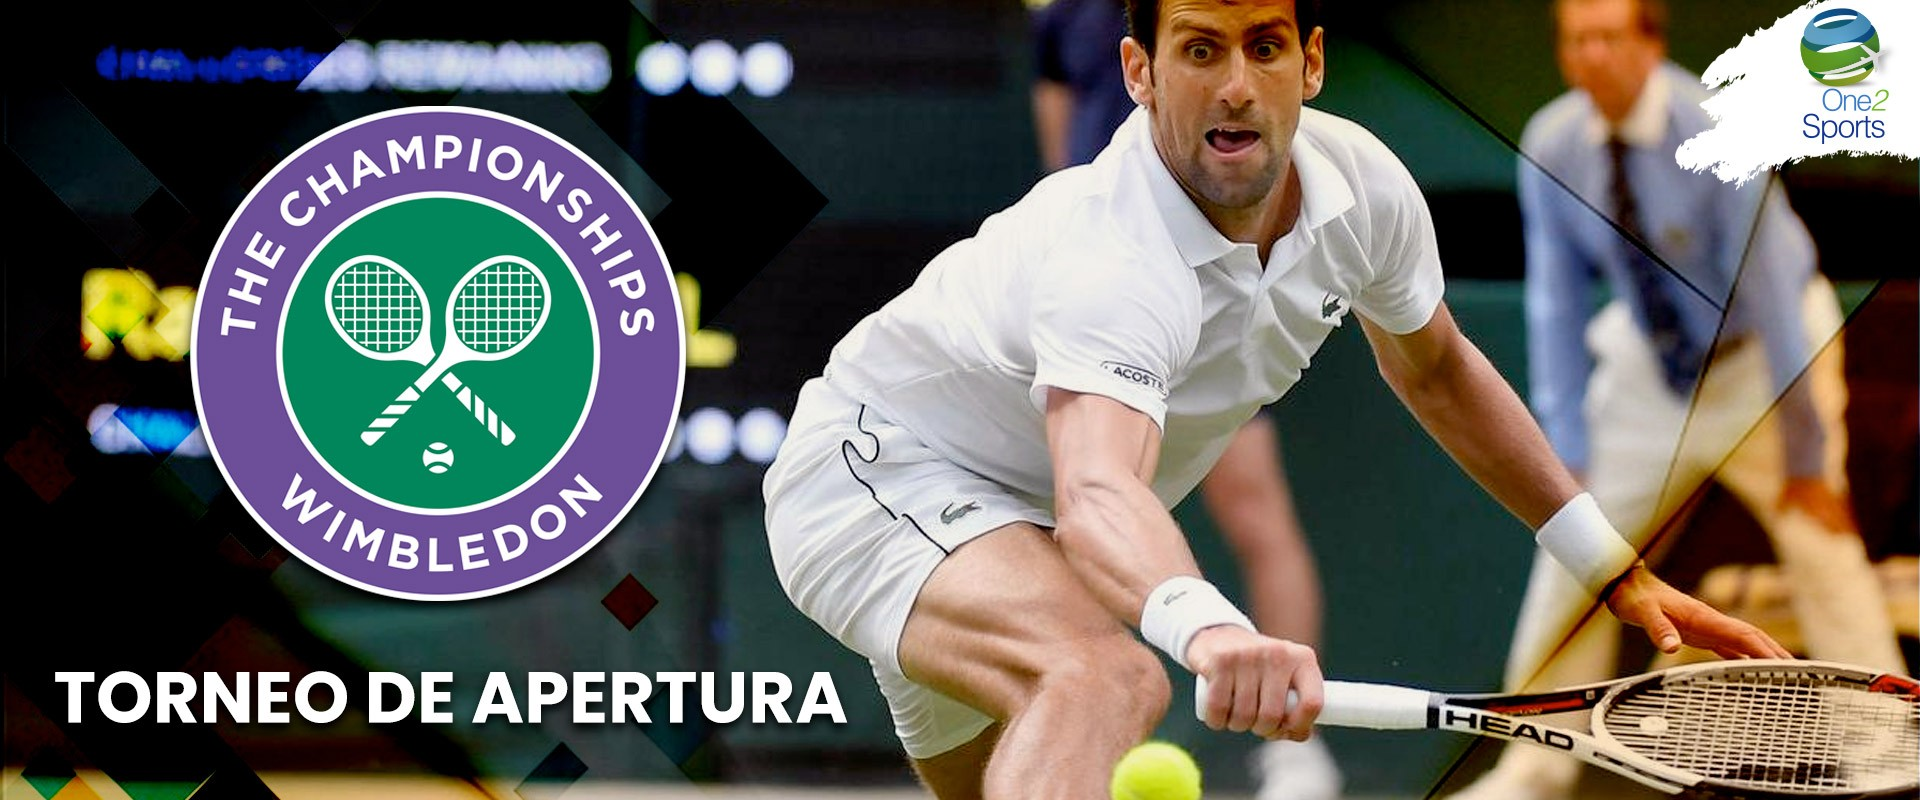 Torneo de Apertura Wimbledon